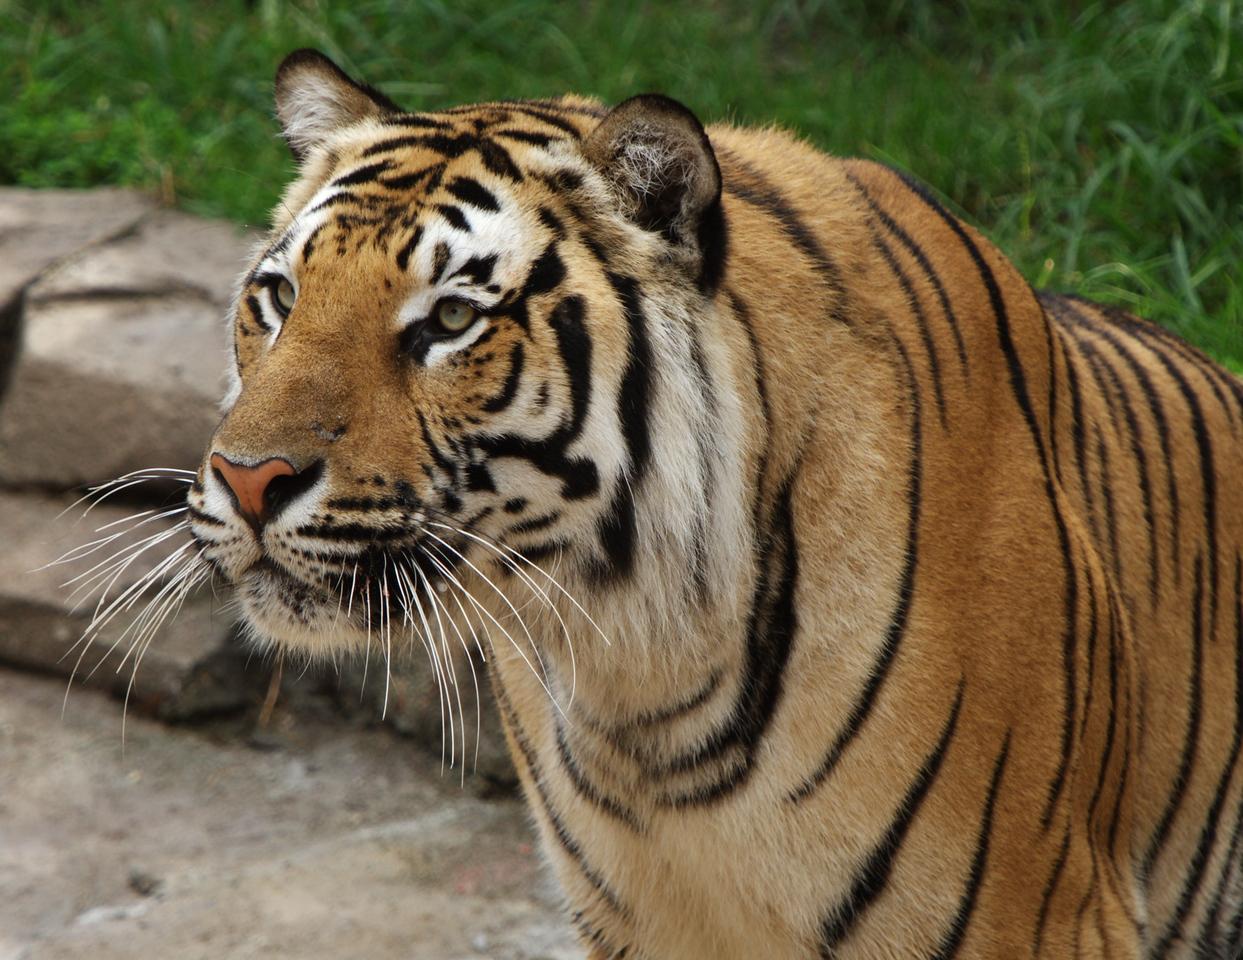 Tiger_Orange_Print_2492